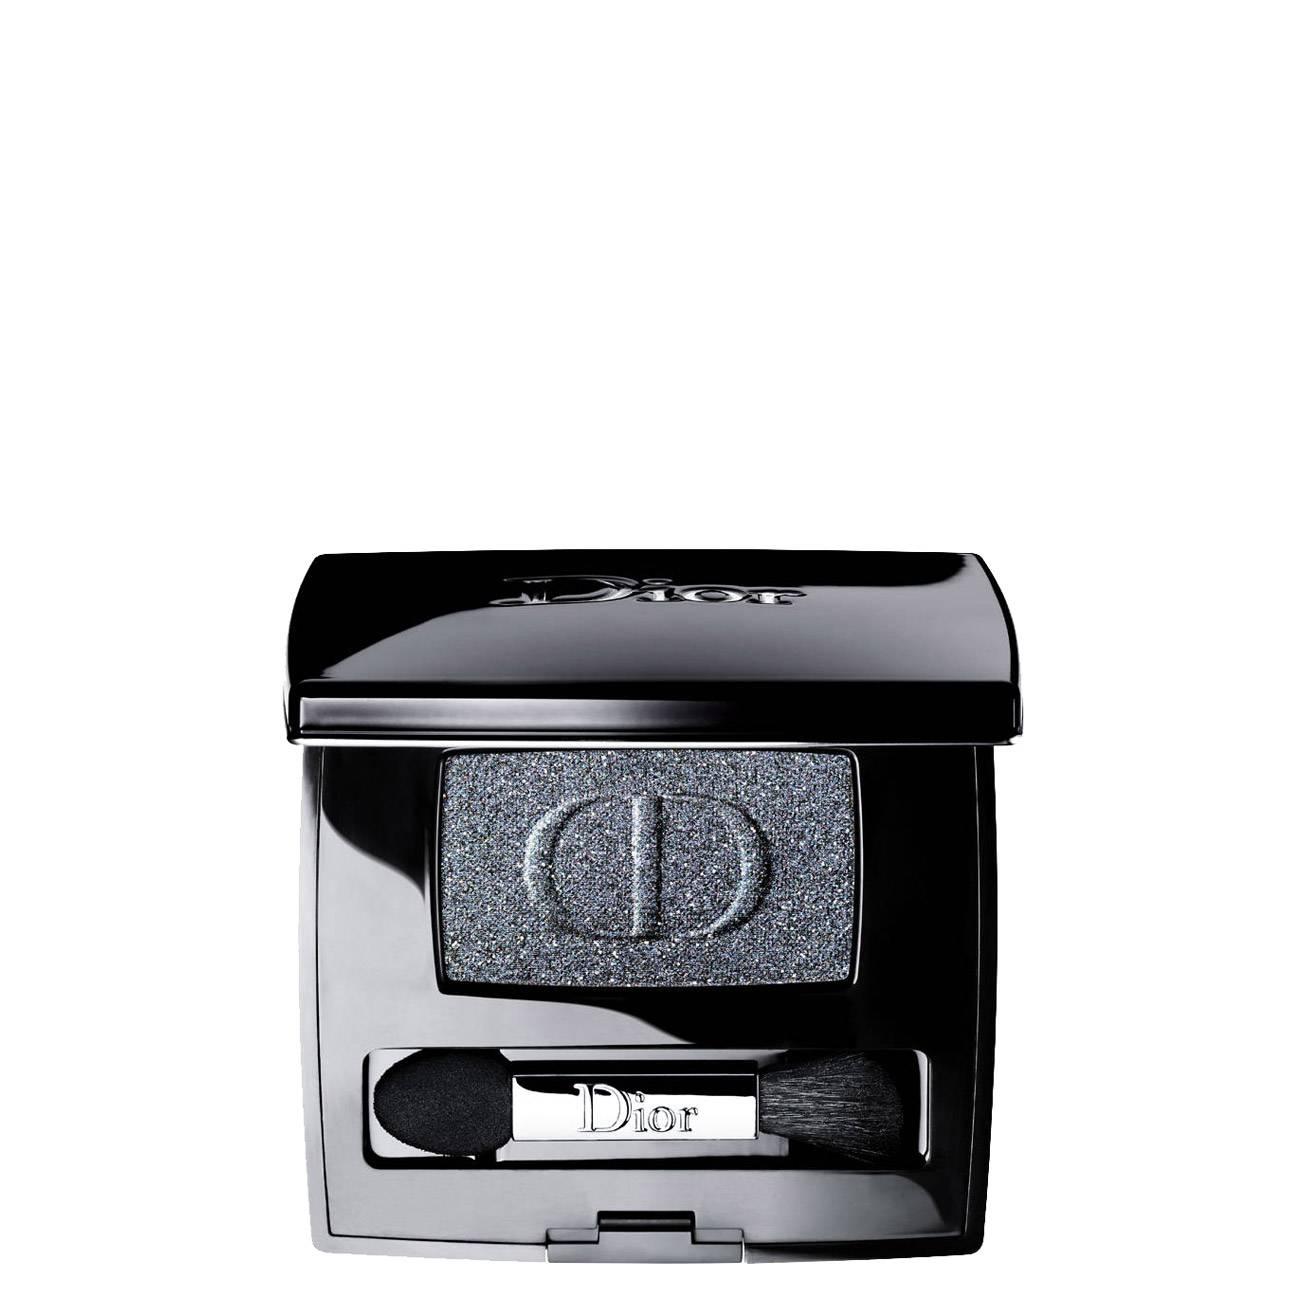 Diorshow Mono 094 2.2 Grame Dior imagine 2021 bestvalue.eu